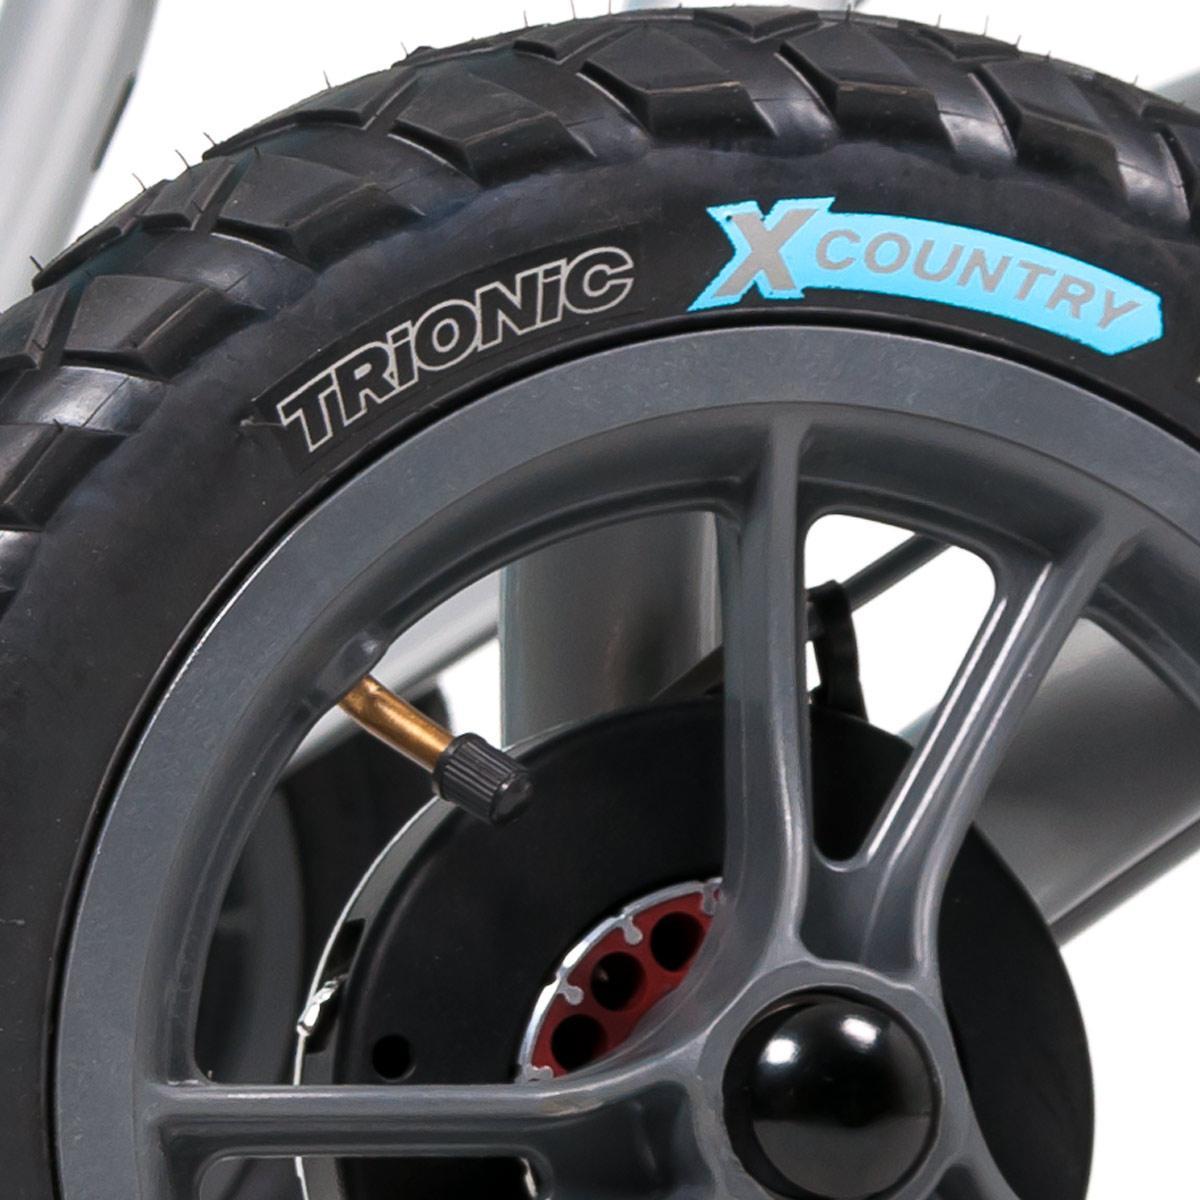 Les pneus Trionic X-Country